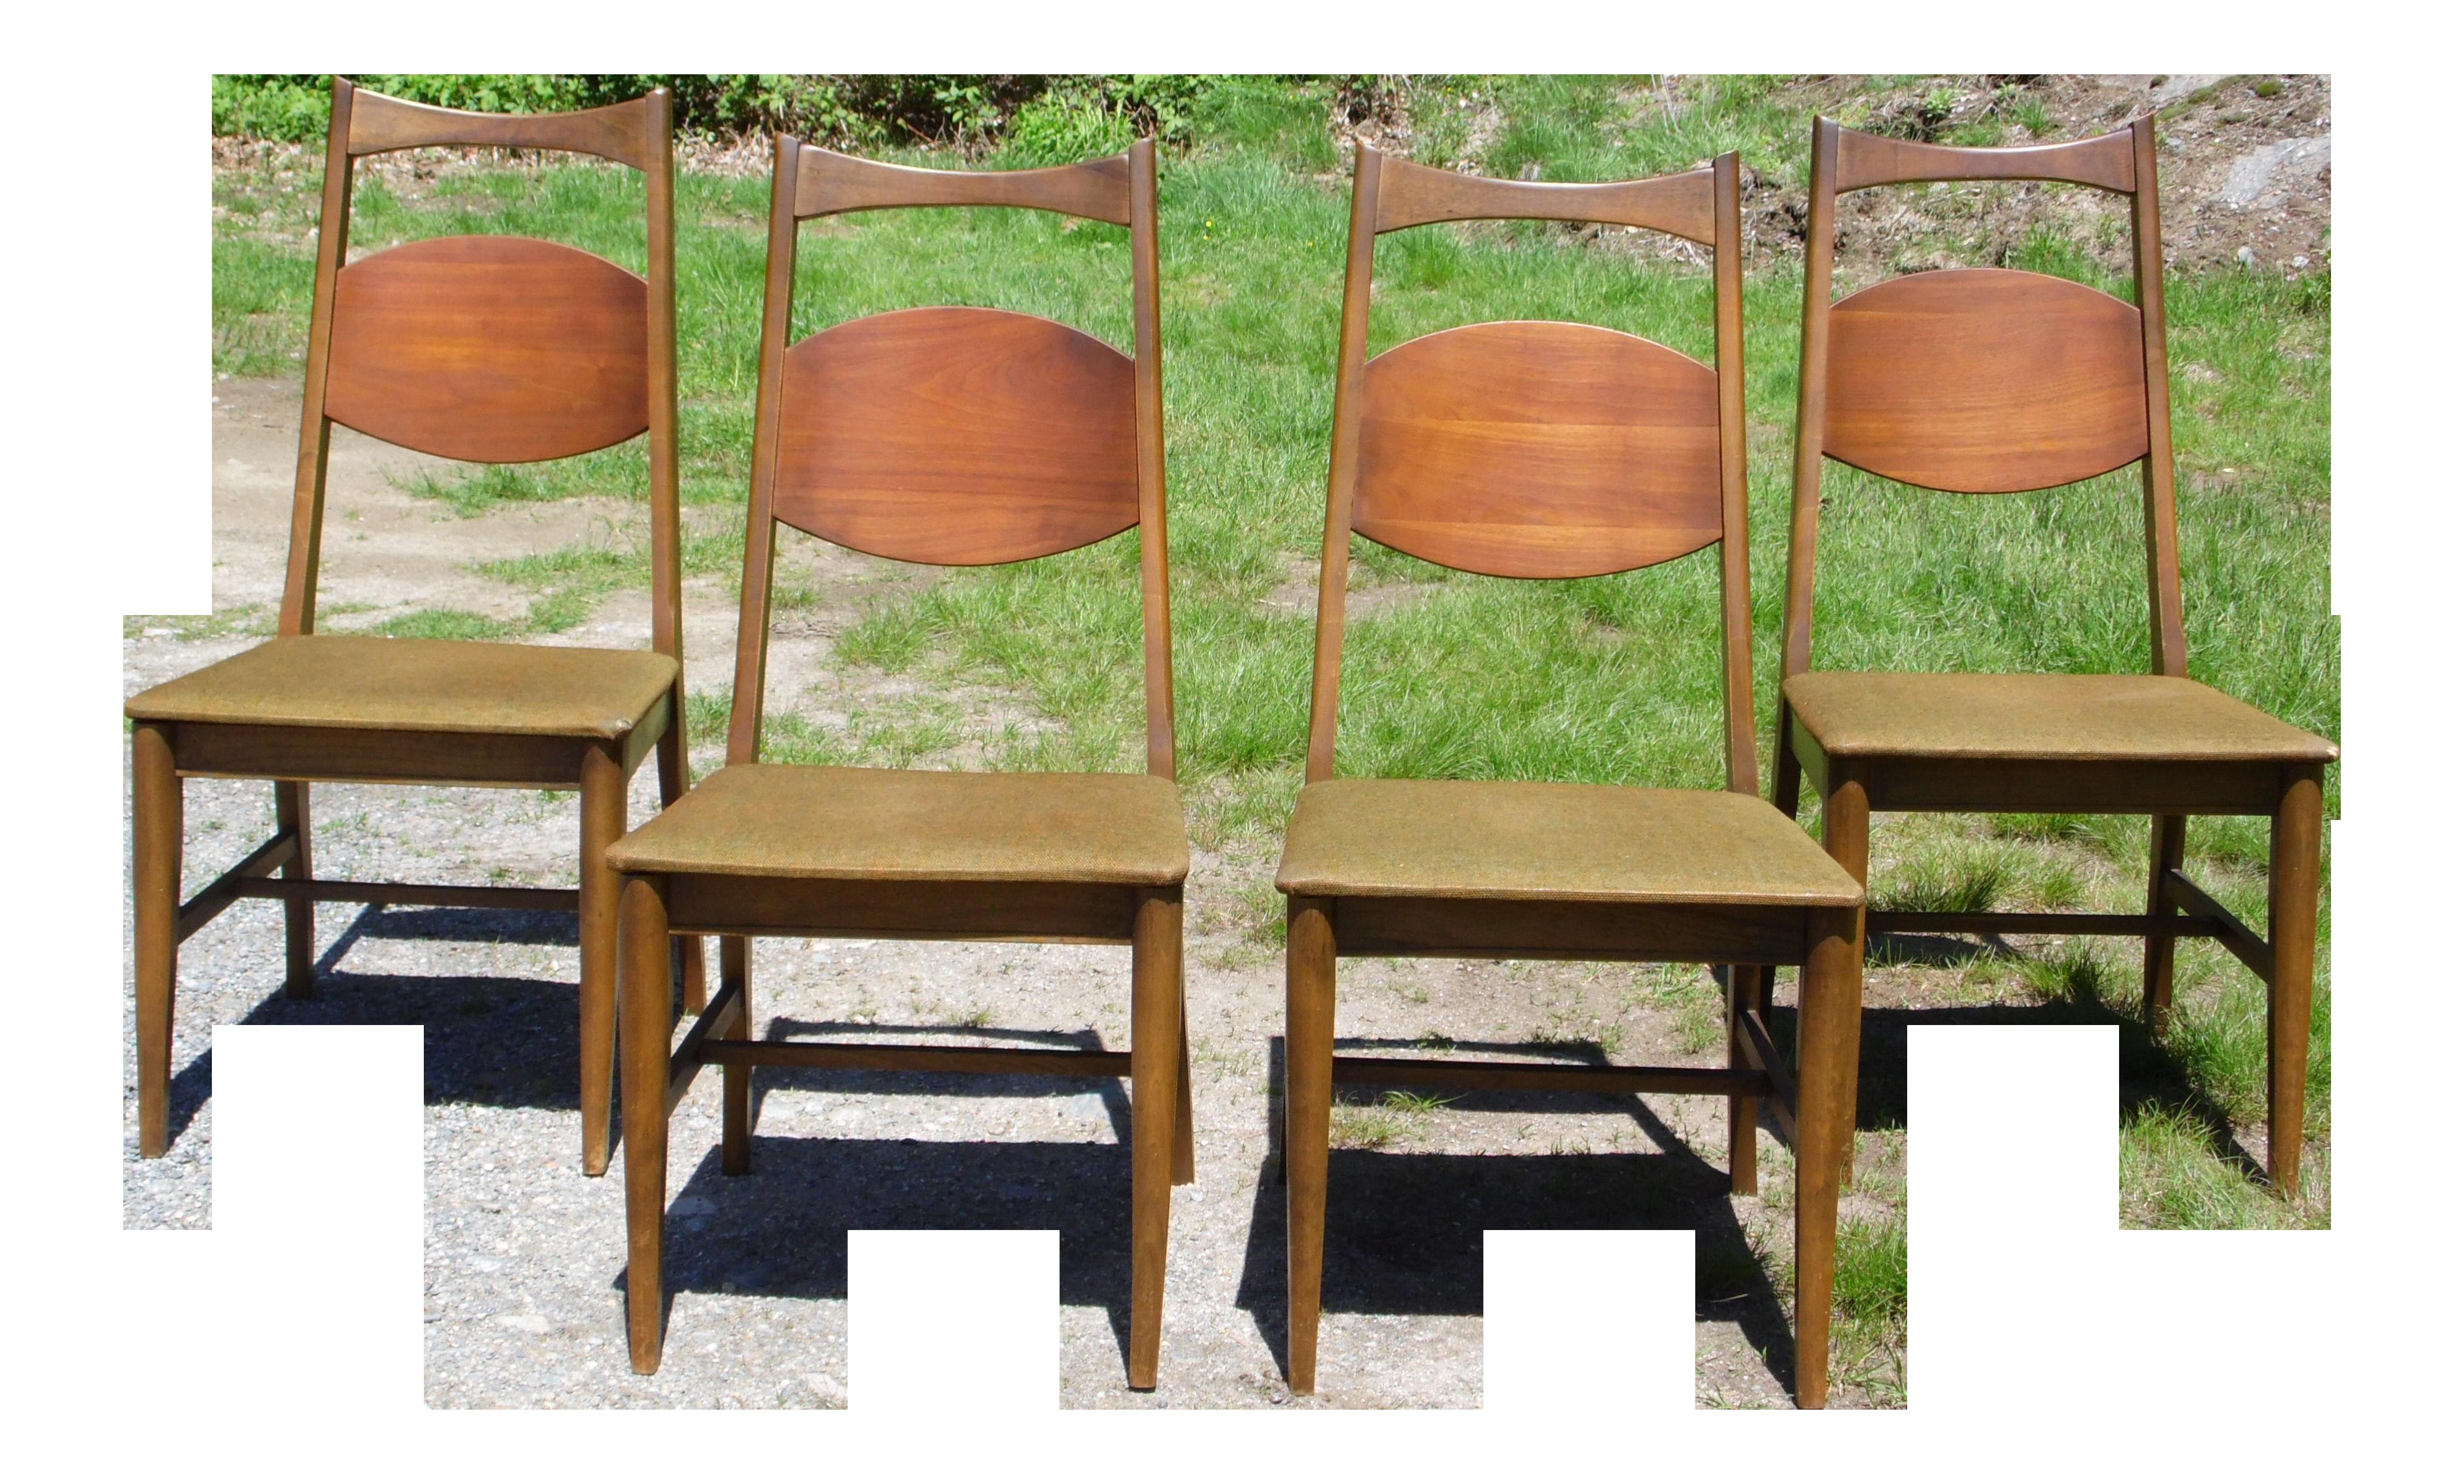 Vintage Bassett Mid Century Modern Walnut Dining Chairs   Set Of 4 |  Chairish